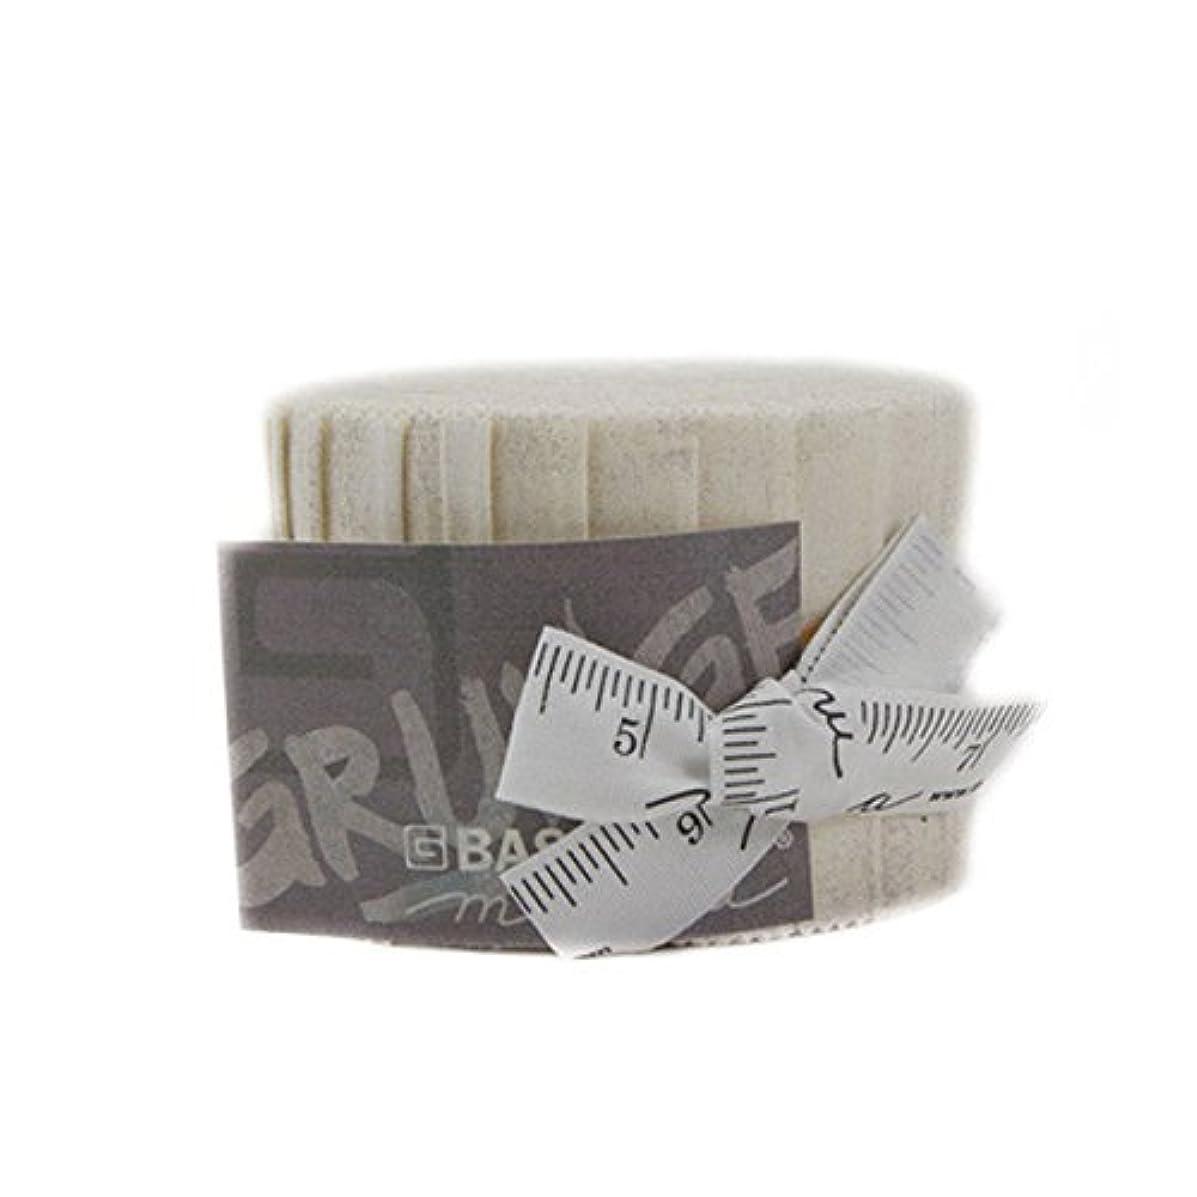 BasicGrey Grunge Basics Crème Junior Jelly Roll 20 2.5-inch Strips Moda Fabrics 30150JJR 270